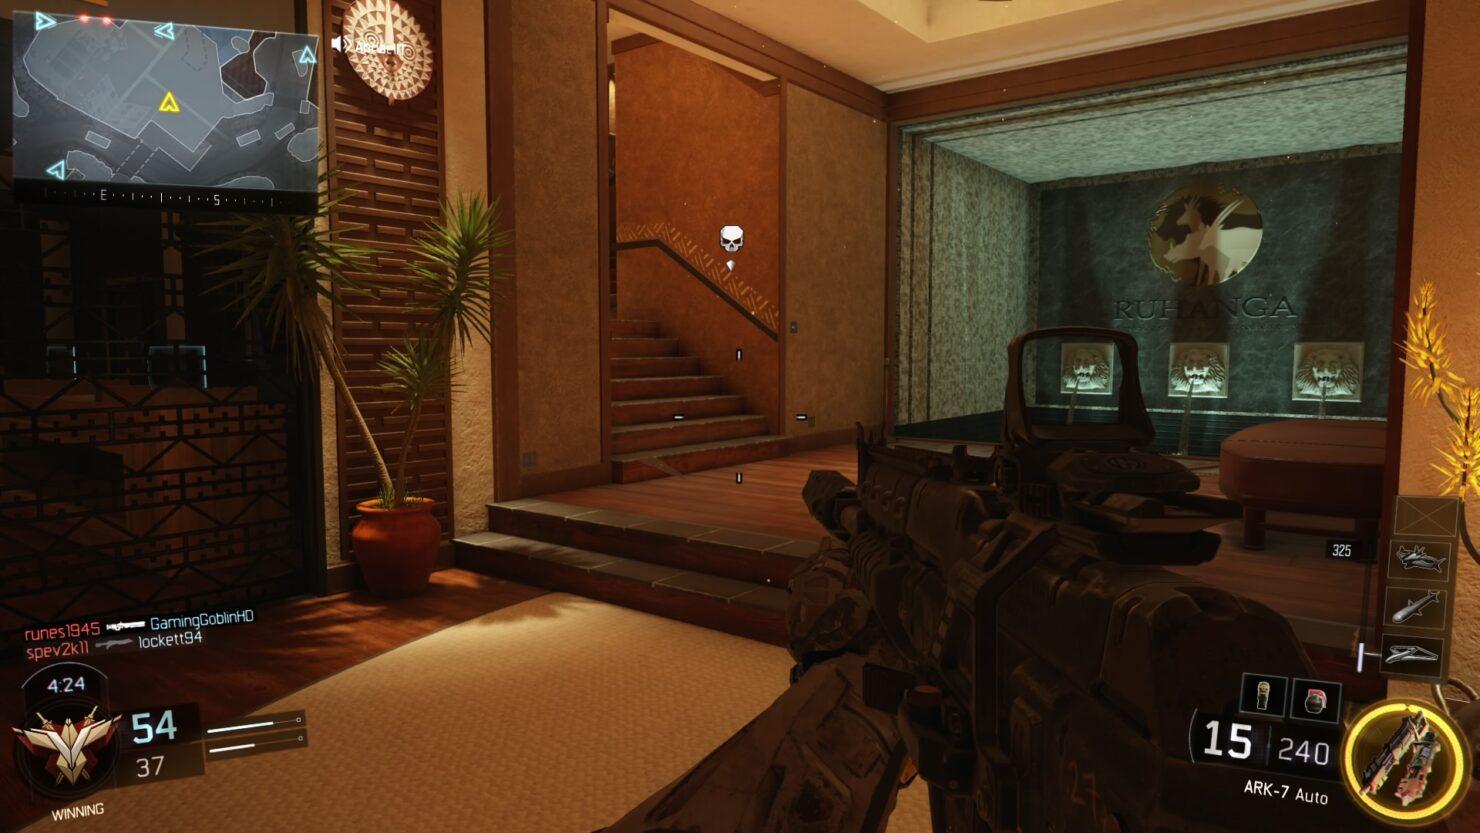 call-of-duty-black-ops-iii-multiplayer-beta_20150819035713